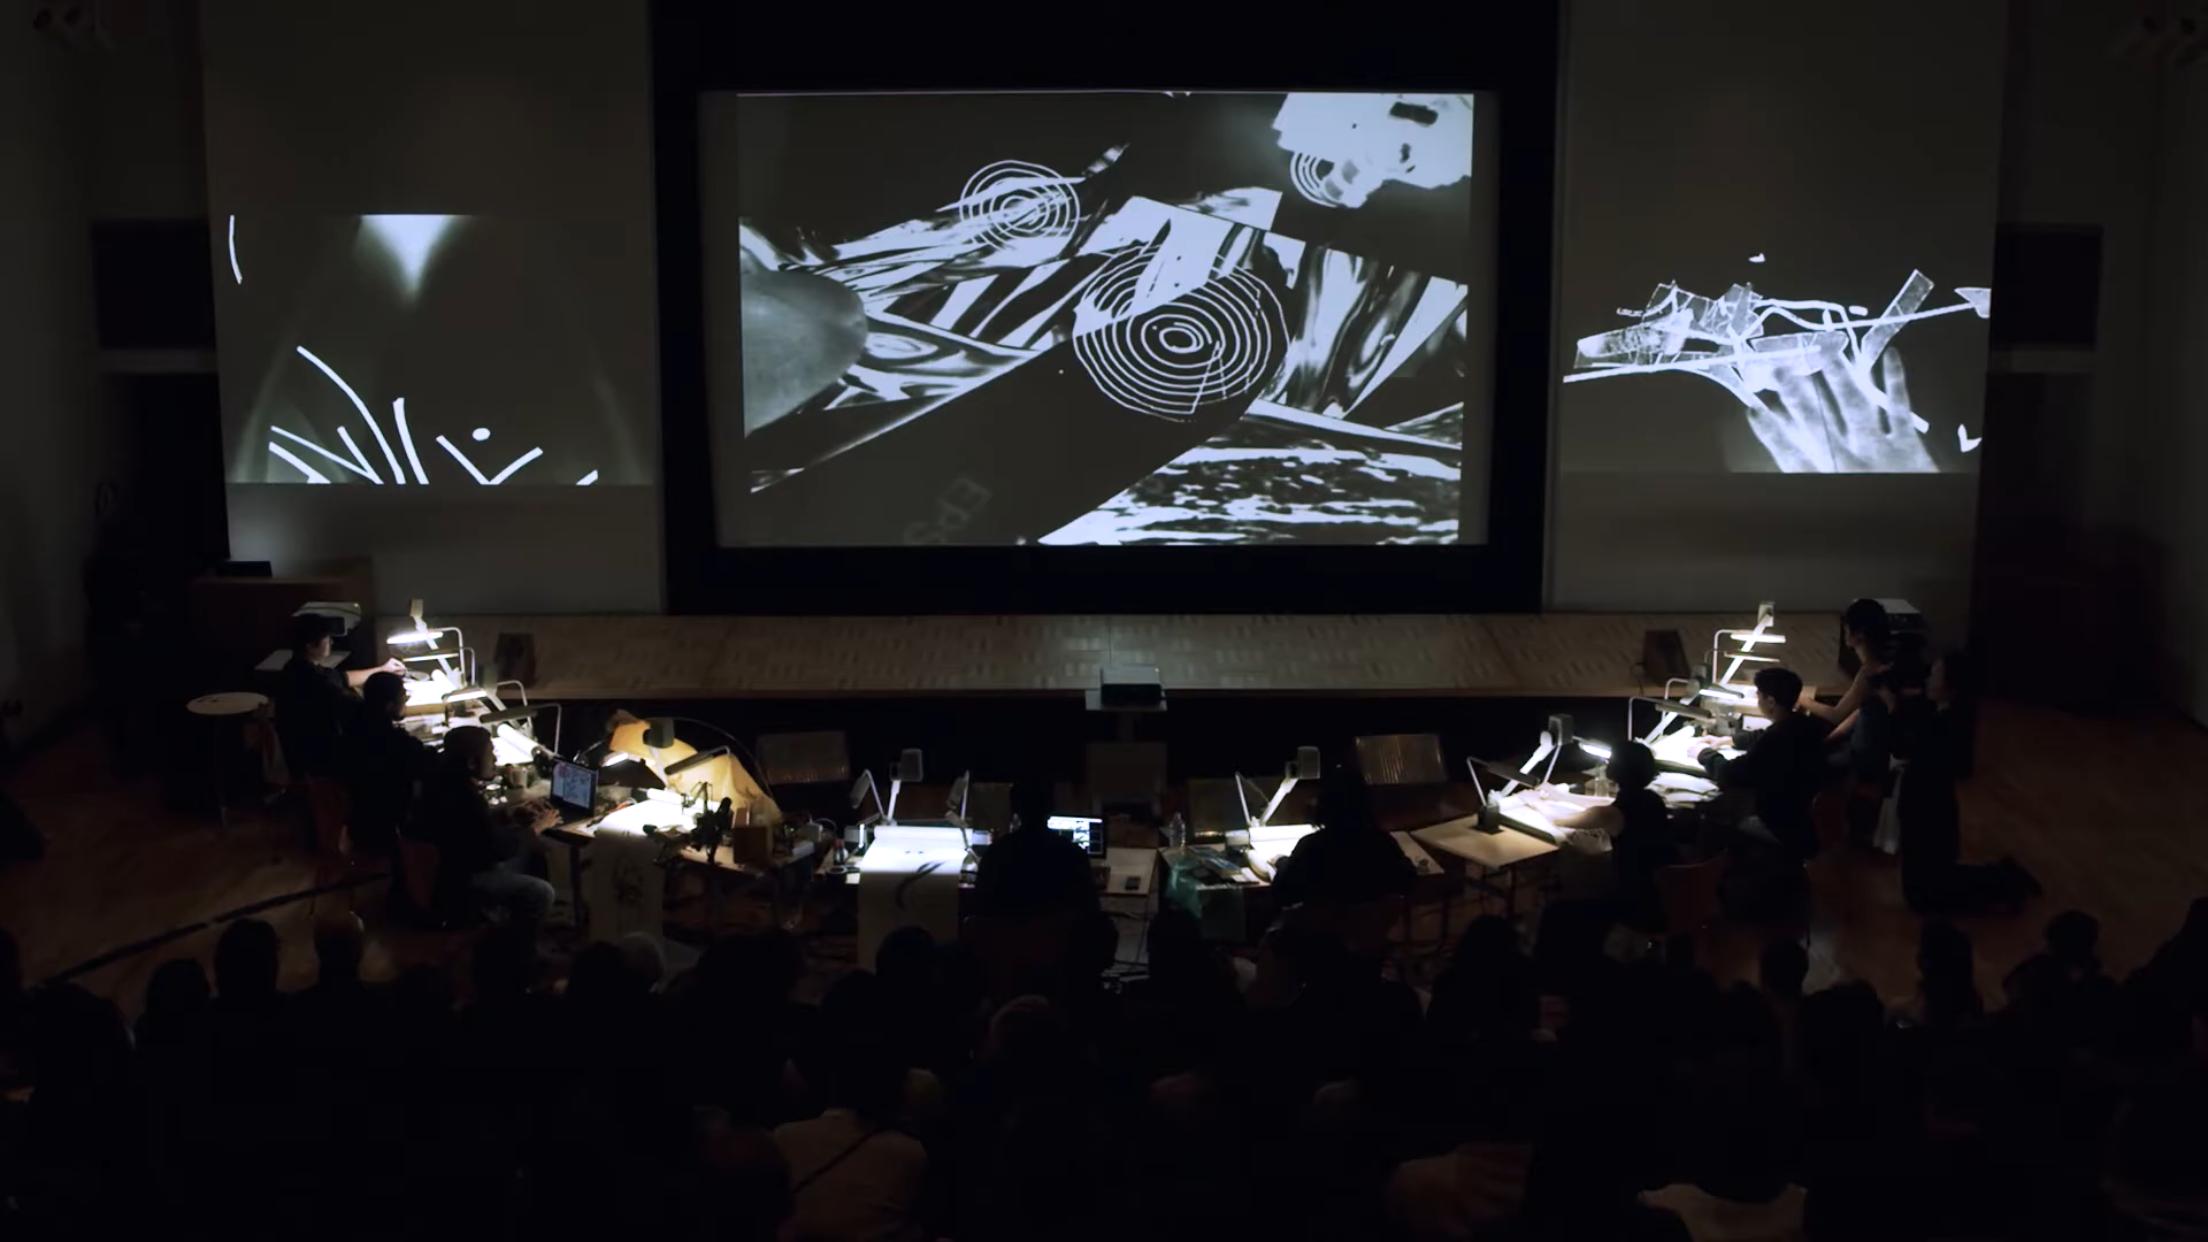 [JP🇯🇵]Drawing Orchestra(ドローイング・オーケストラ)feat. 鈴木ヒラク、大原大次郎、カニエ・ナハ、西野壮平、ハラサオリ、村田峰紀、やんツー、BIEN